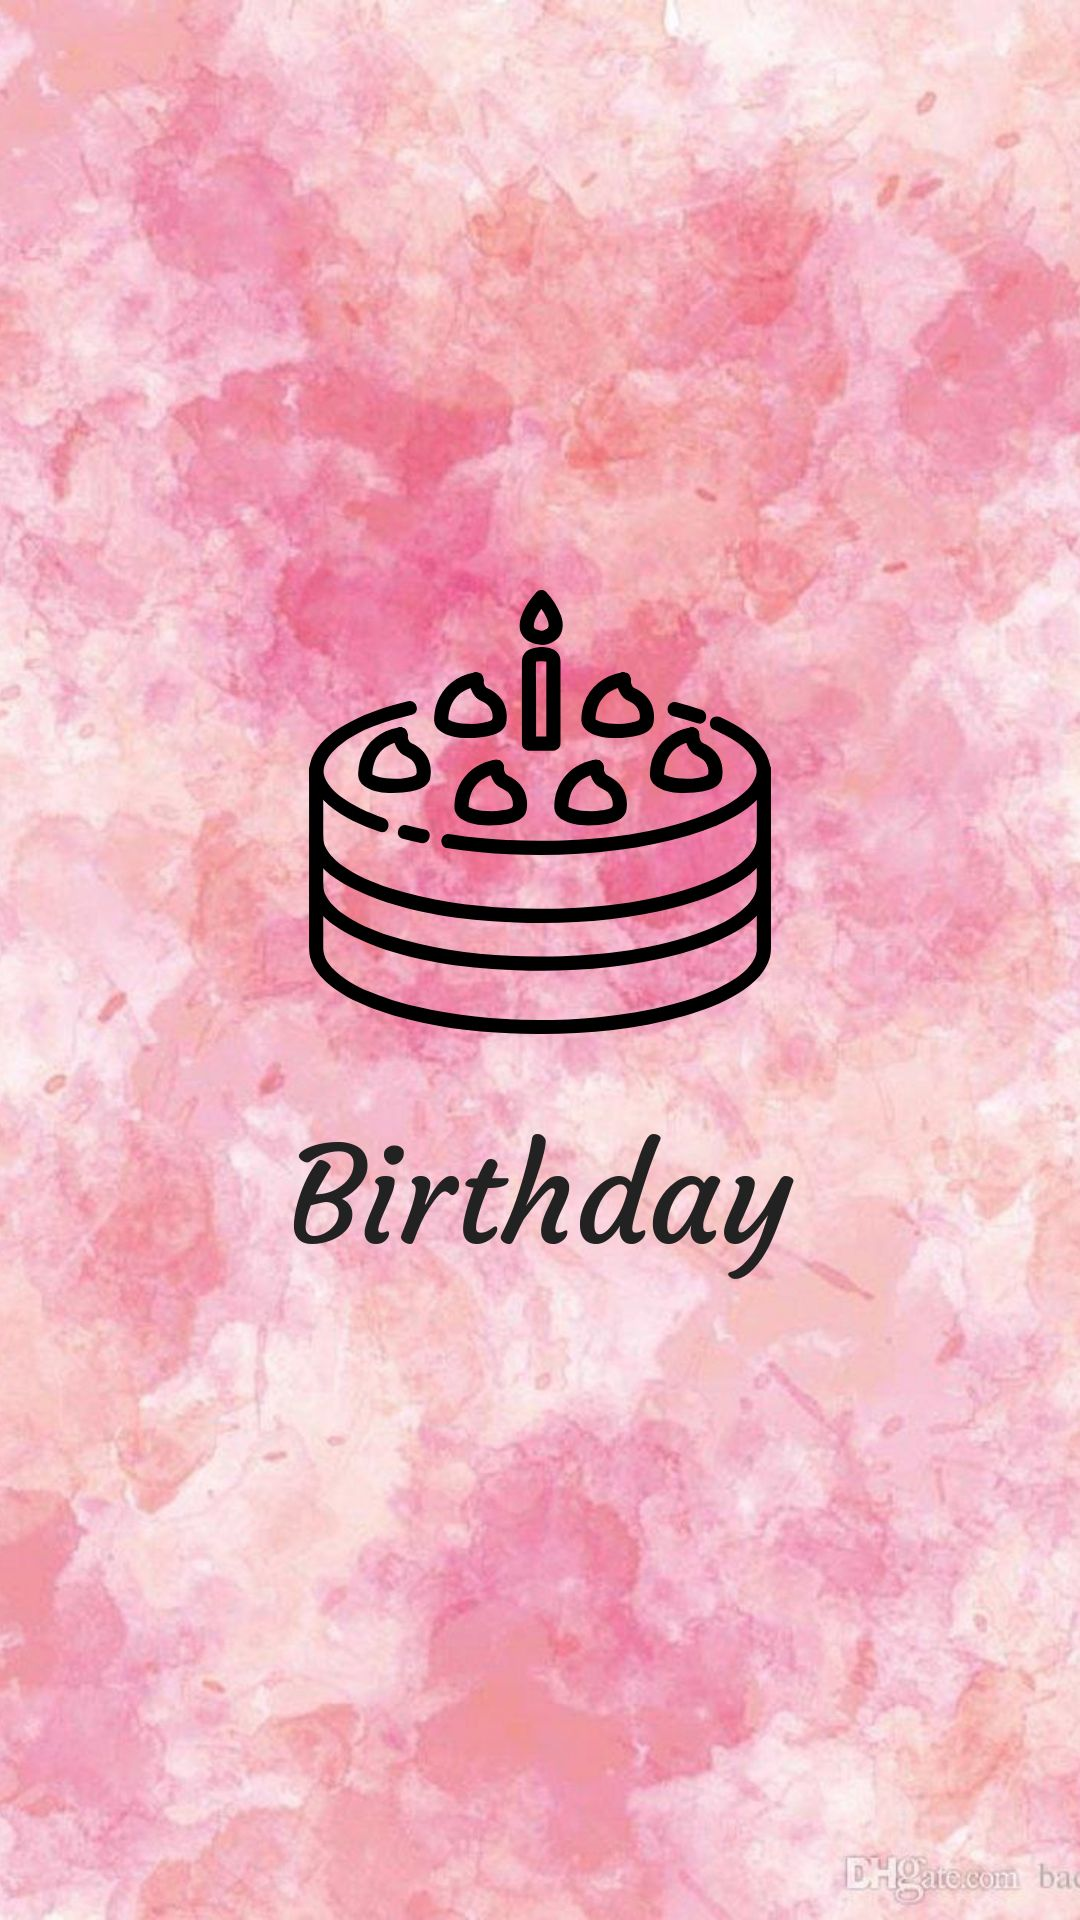 Background For Instagram Highlight My Birthday Birthday Background Wallpaper Birthday Icon Instagram Highlight Icons